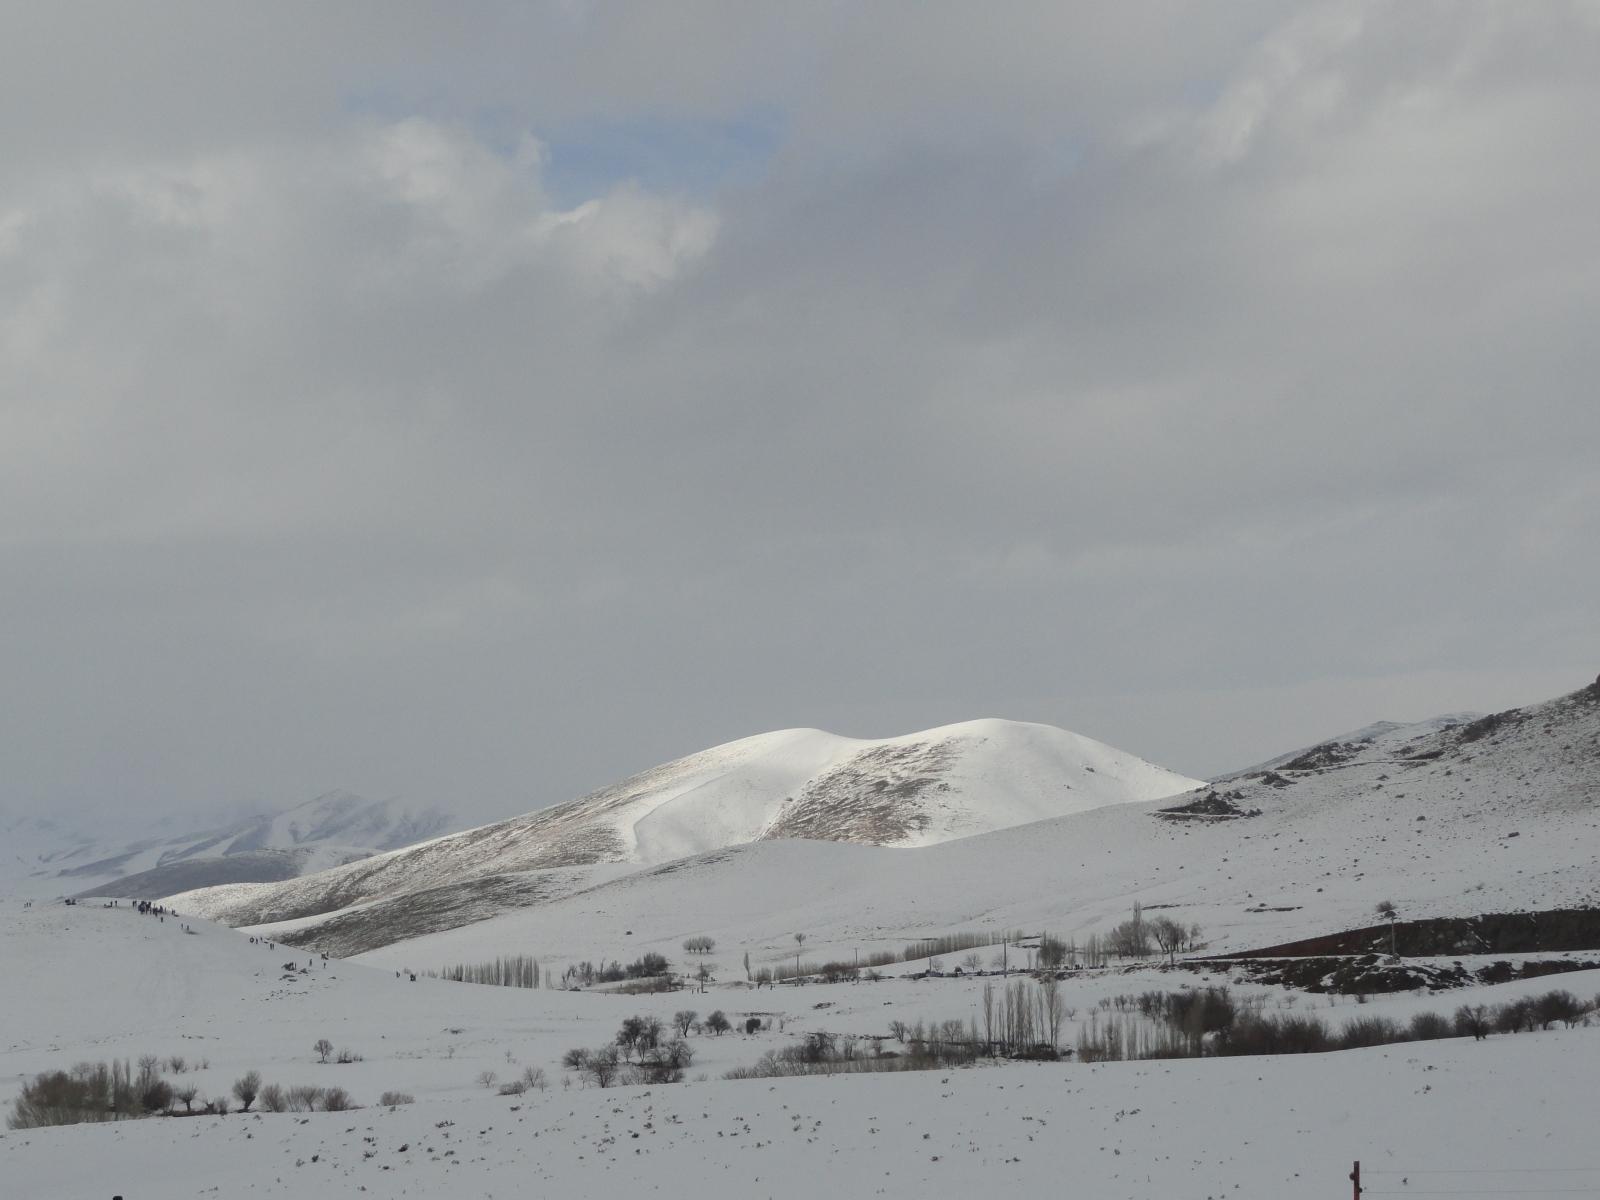 Hendodar ski resort scenery around Arak, Mount Damavand